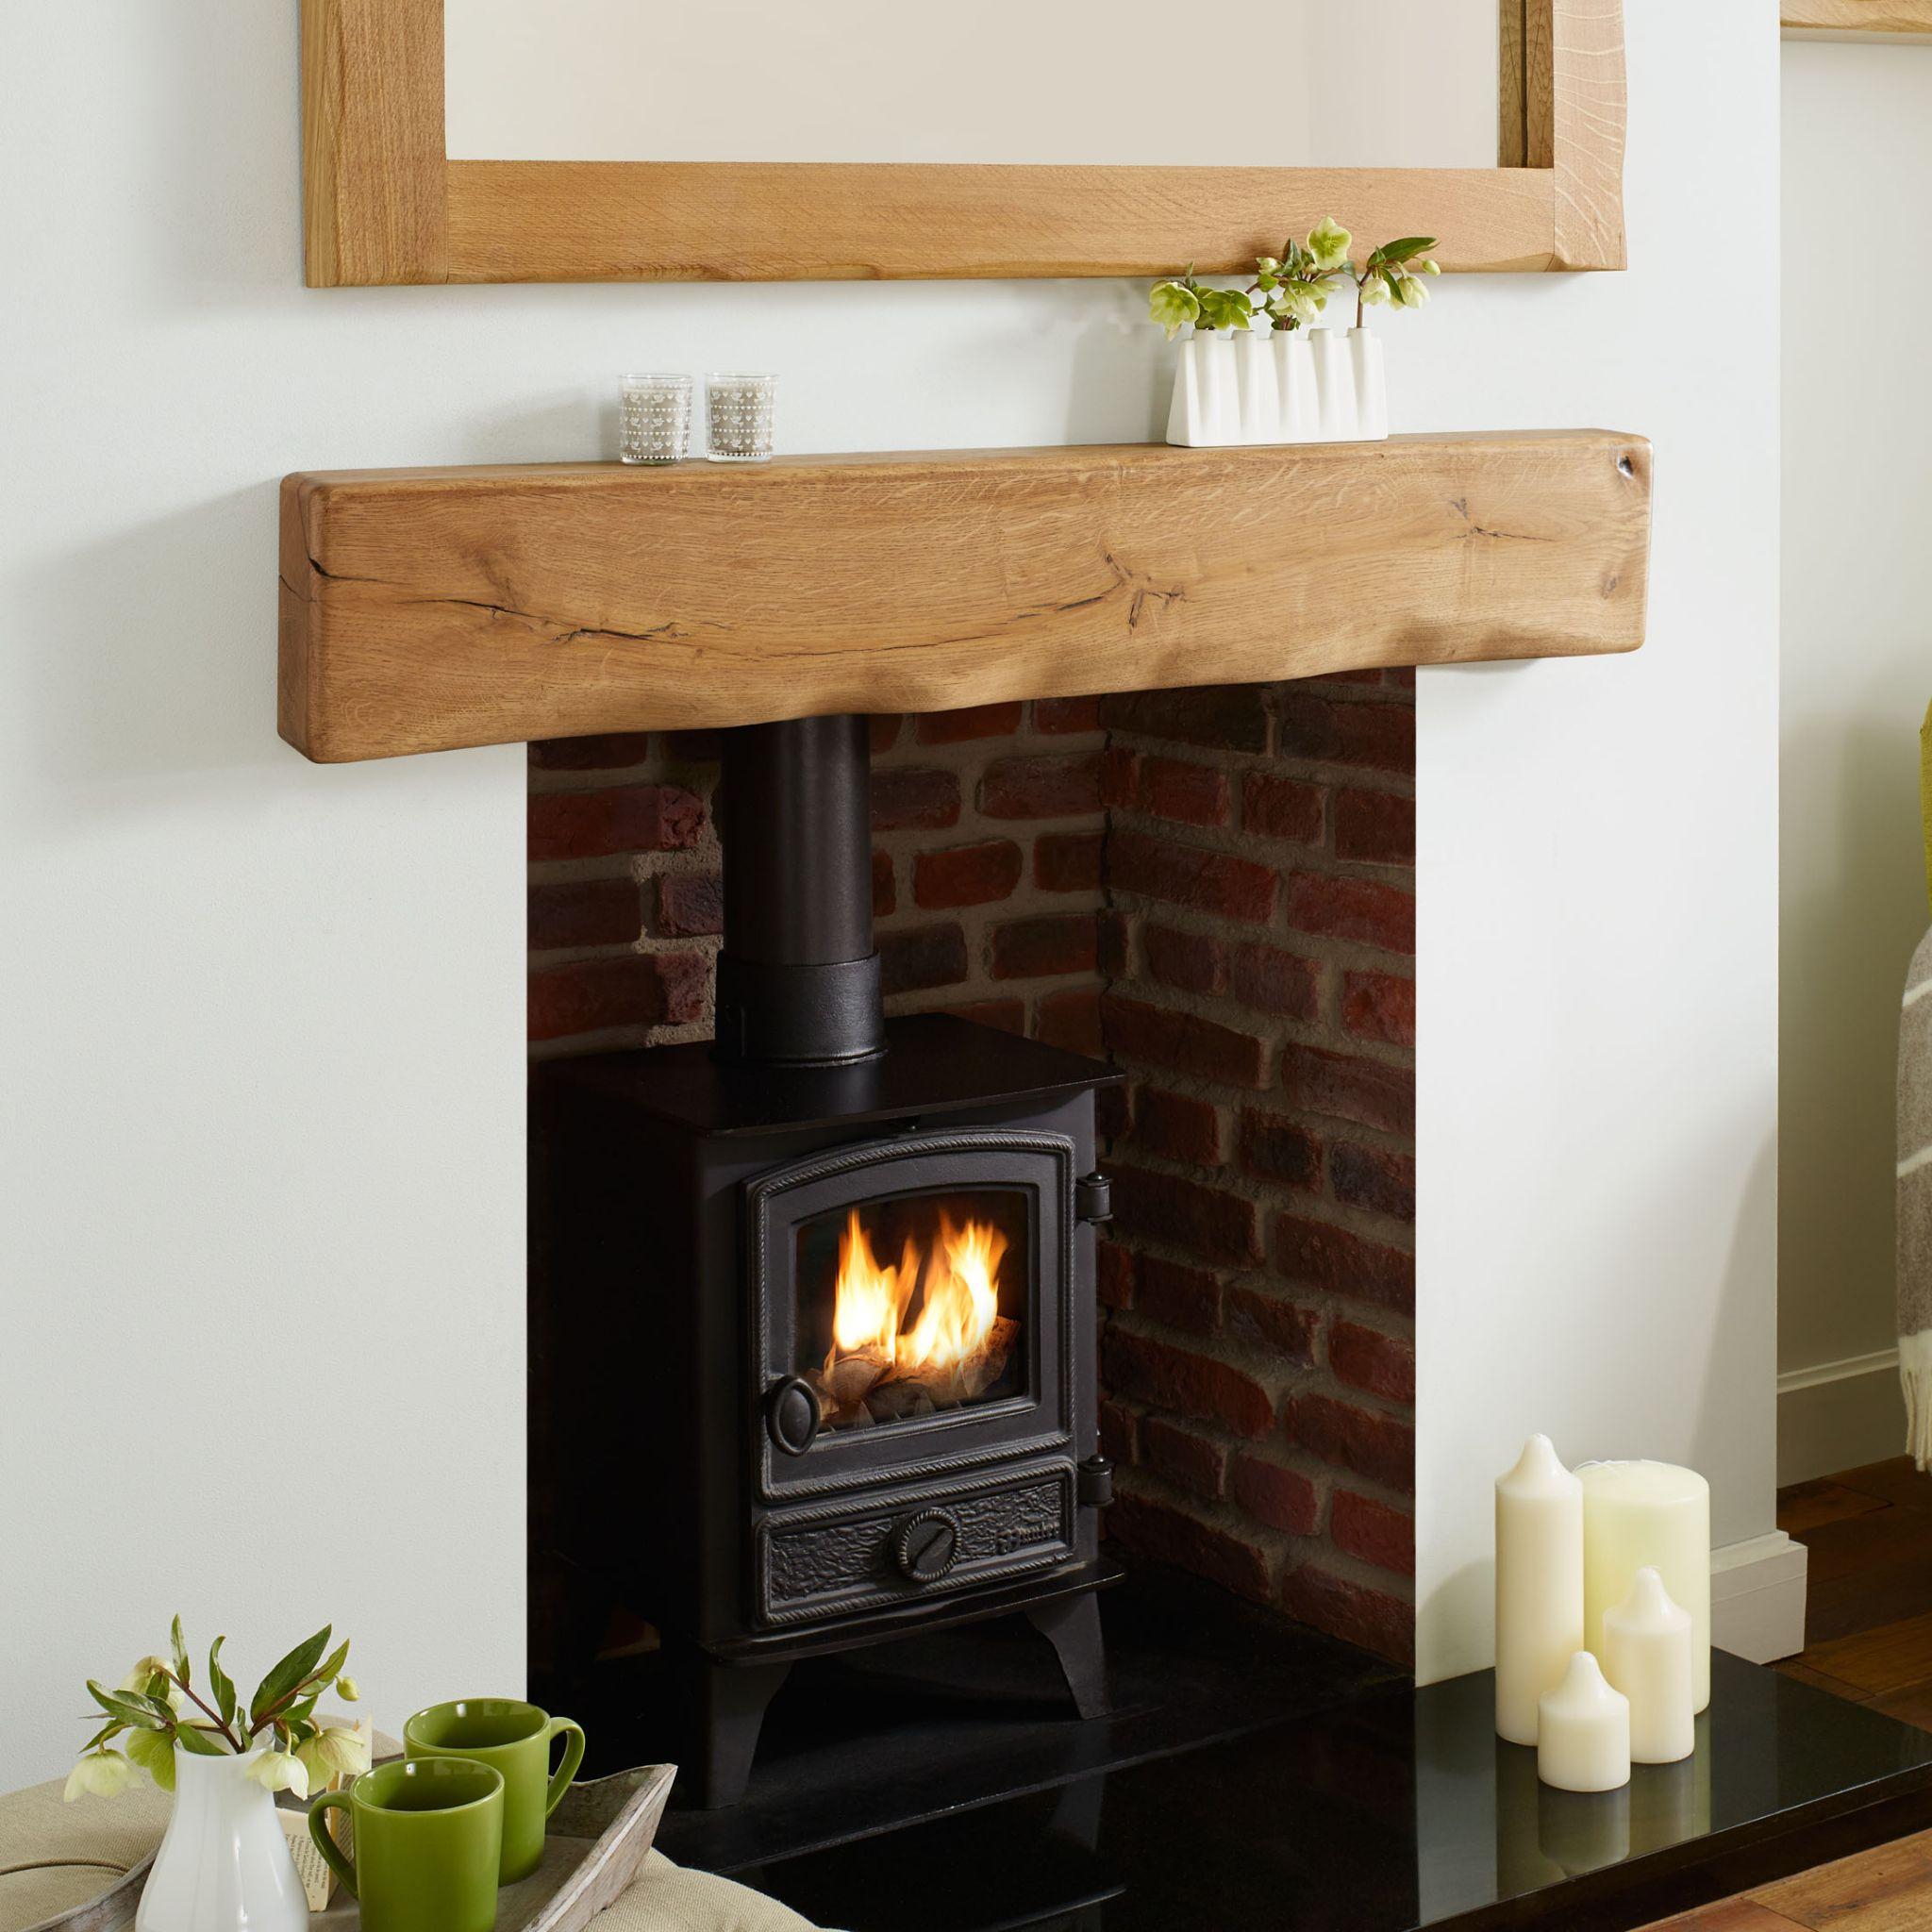 Solid Oak Beam Rustic Character Mantel Shelf